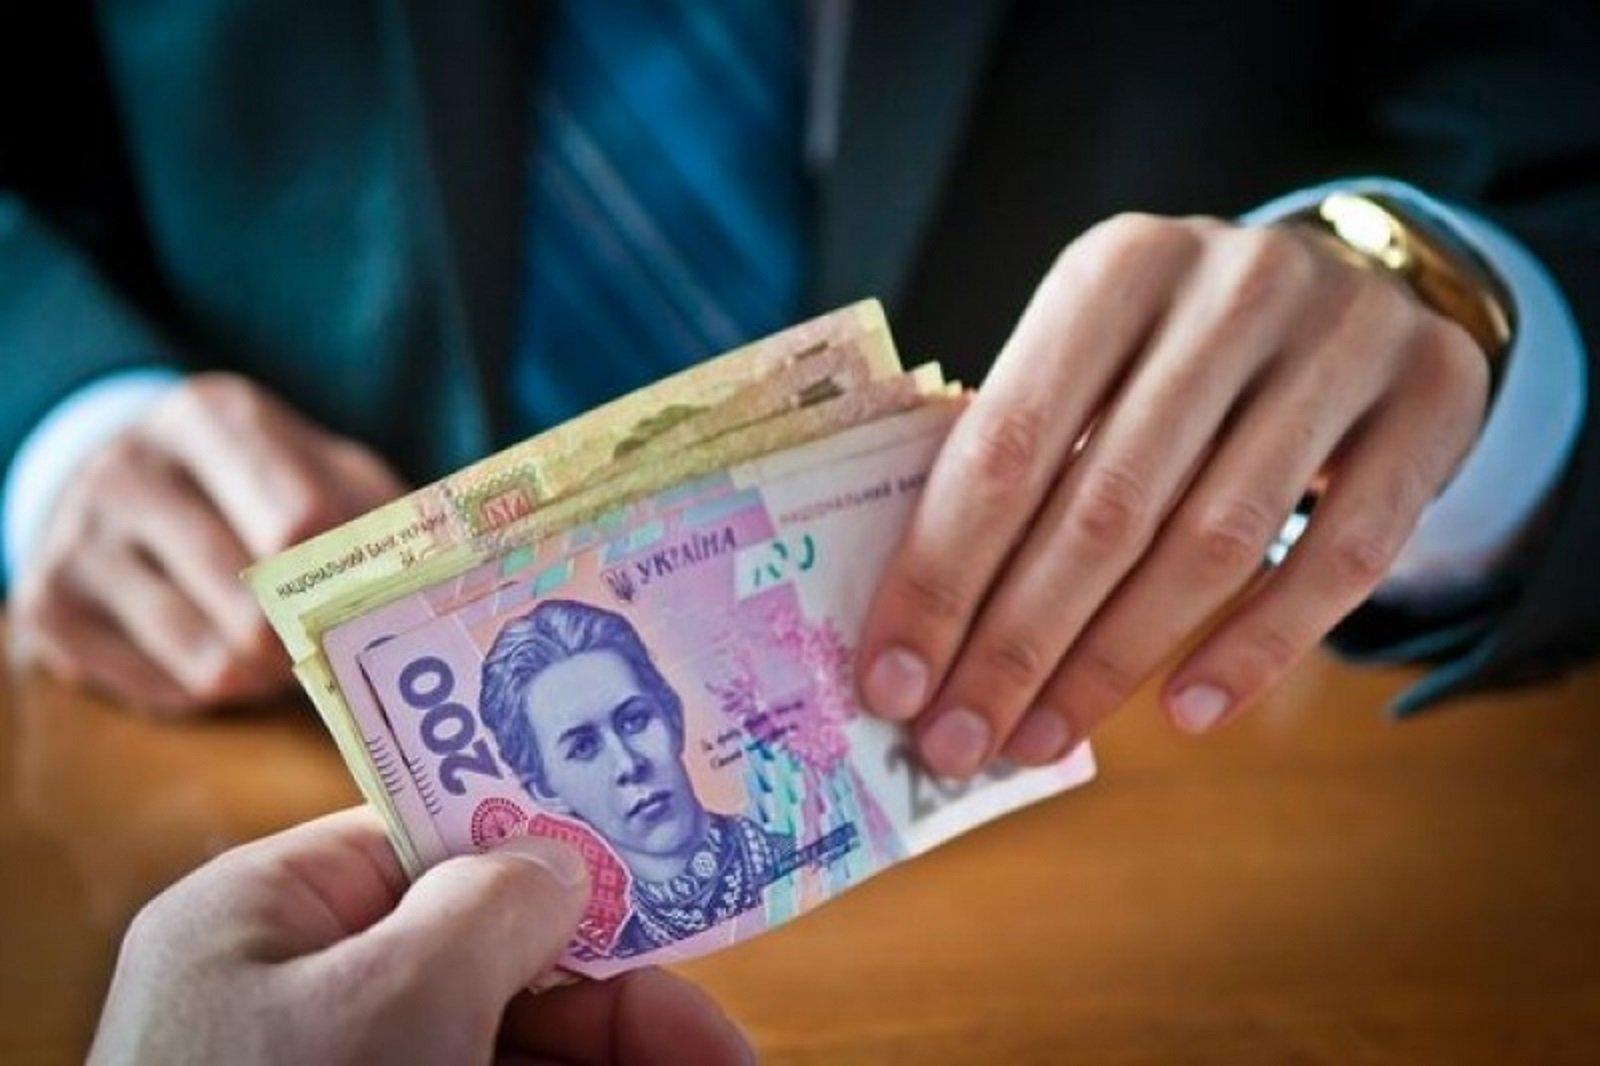 В Україні за місяць середня зарплата зросла на 150 грн -  - 1493098667 publications c9f4d4ac878e3ea639887592bb933ba2